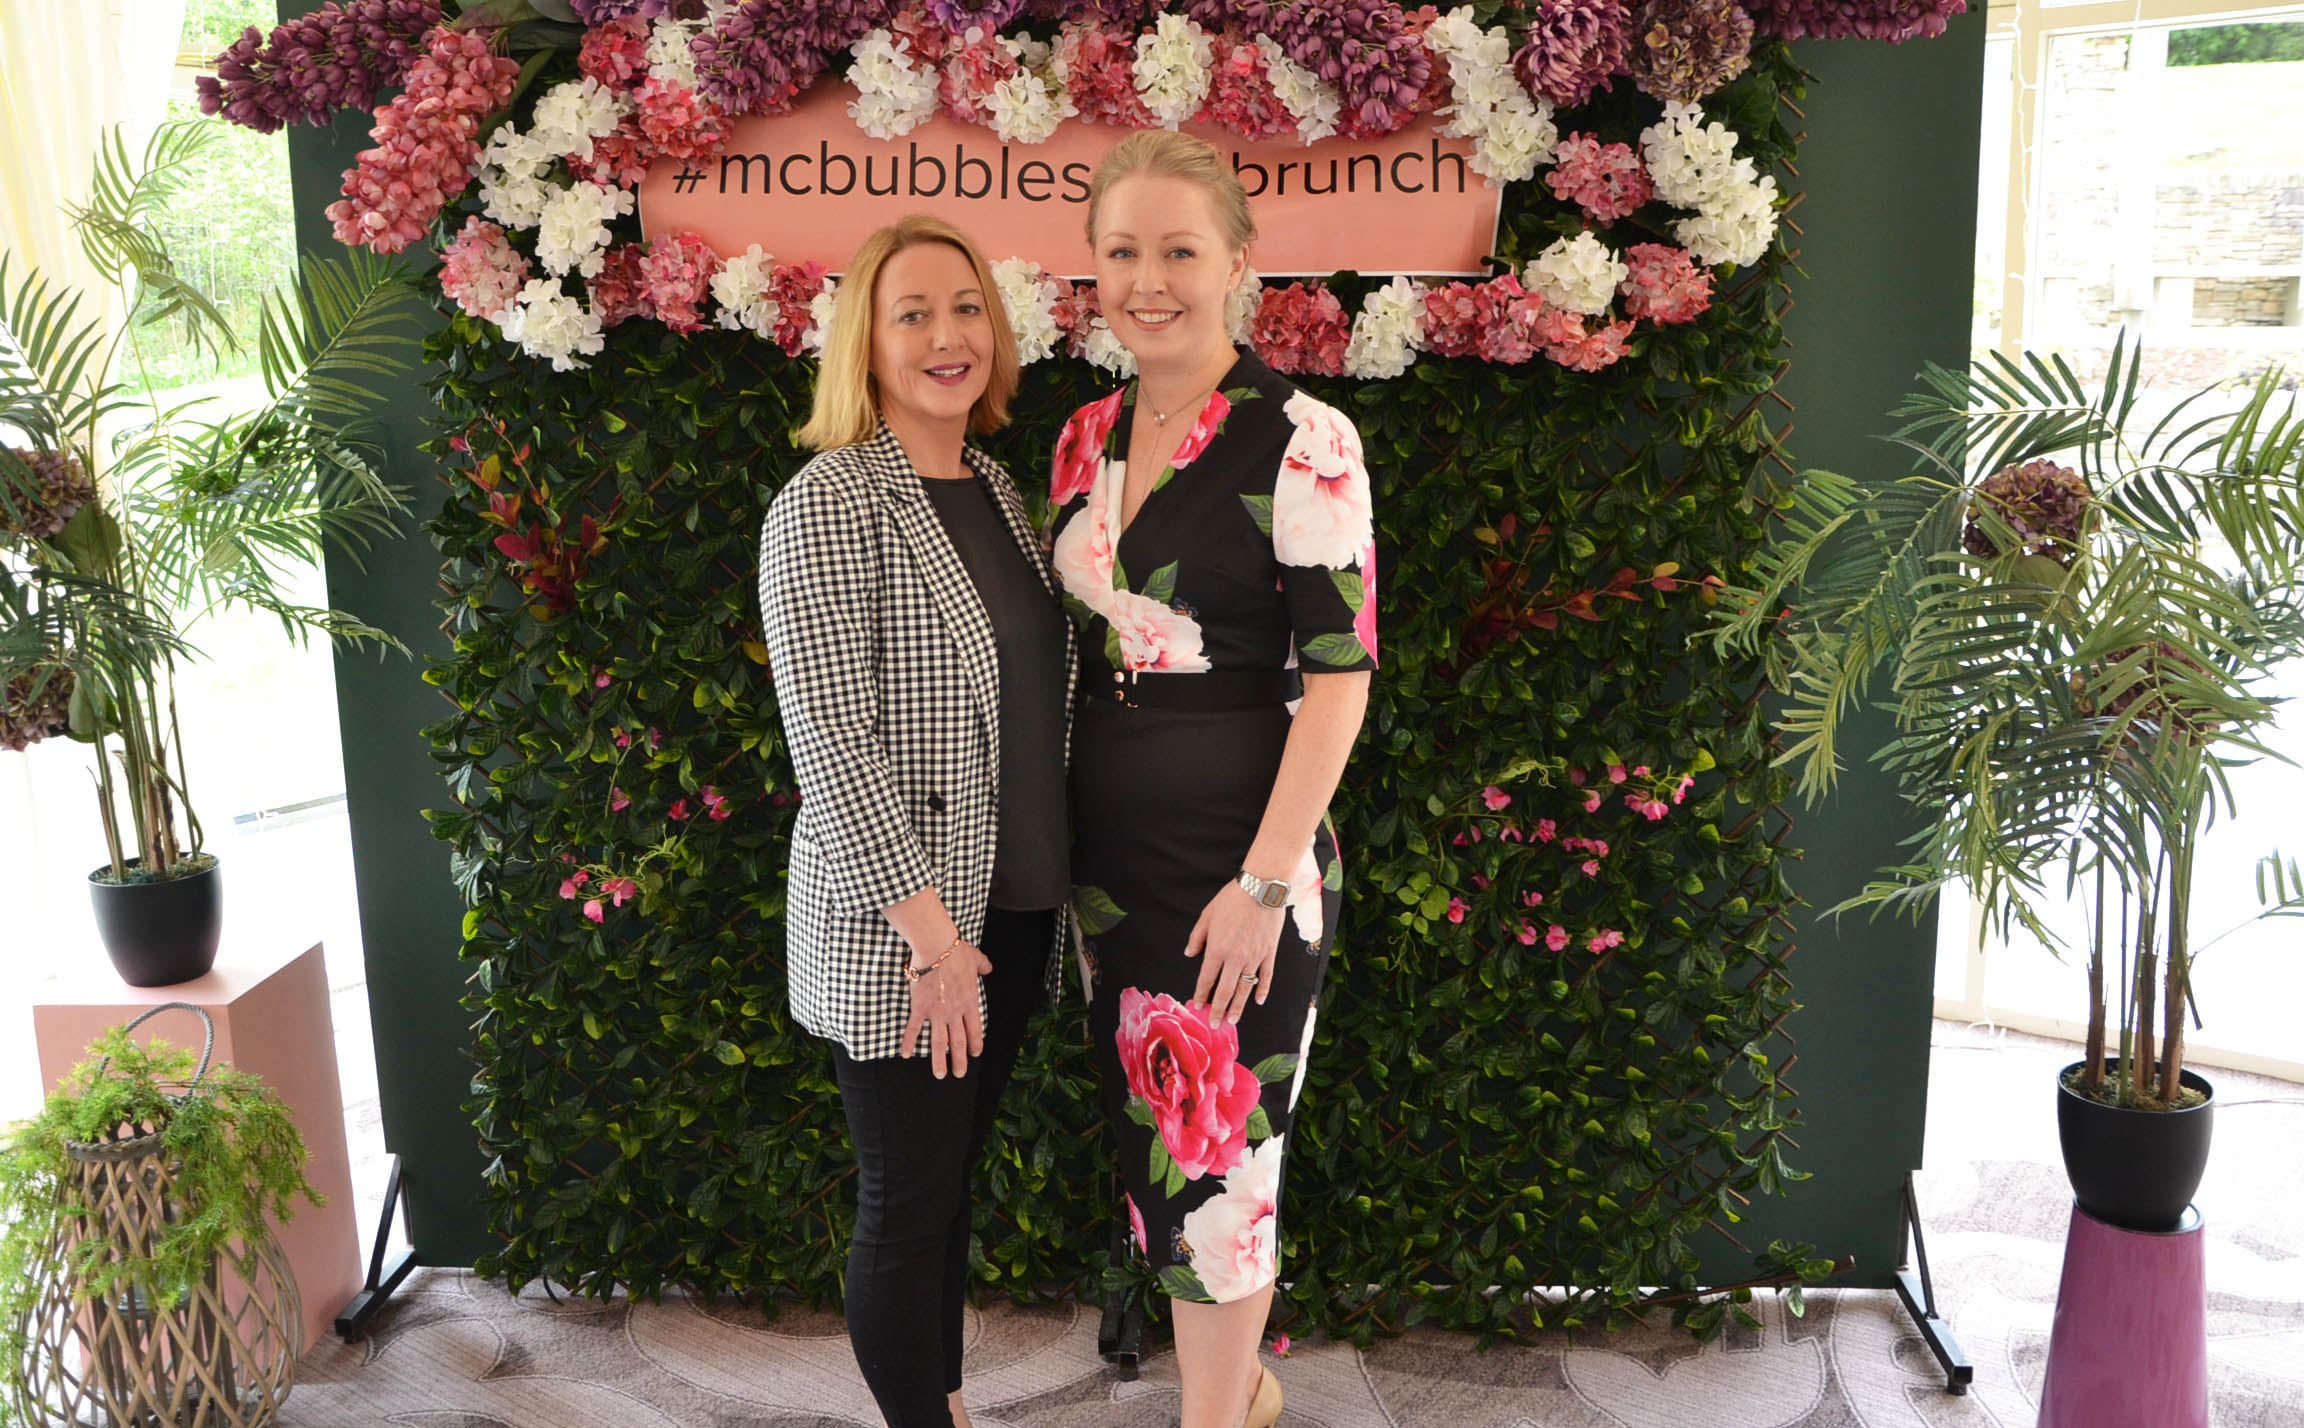 5-star Fashion at a 5-star event in the 5-star Lough Eske